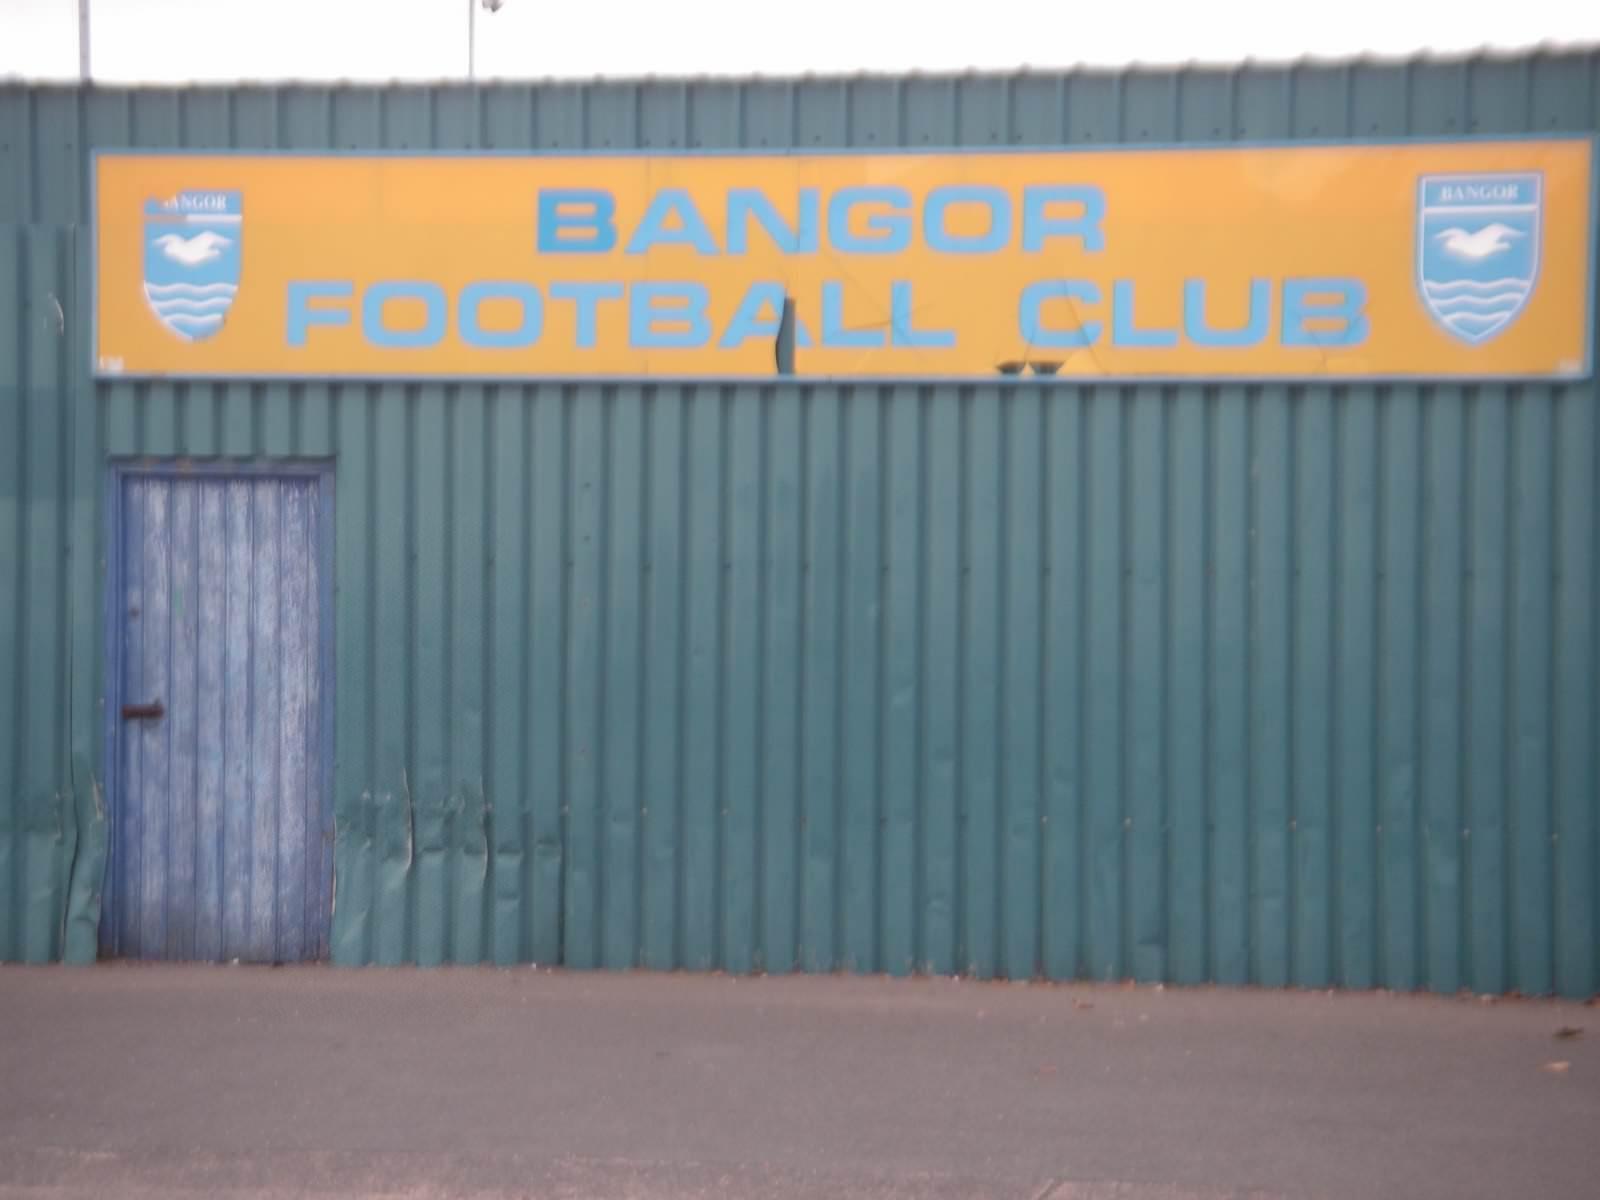 Jonny Blair a lifestyle of travel Bangor FC Bangor Northern Ireland